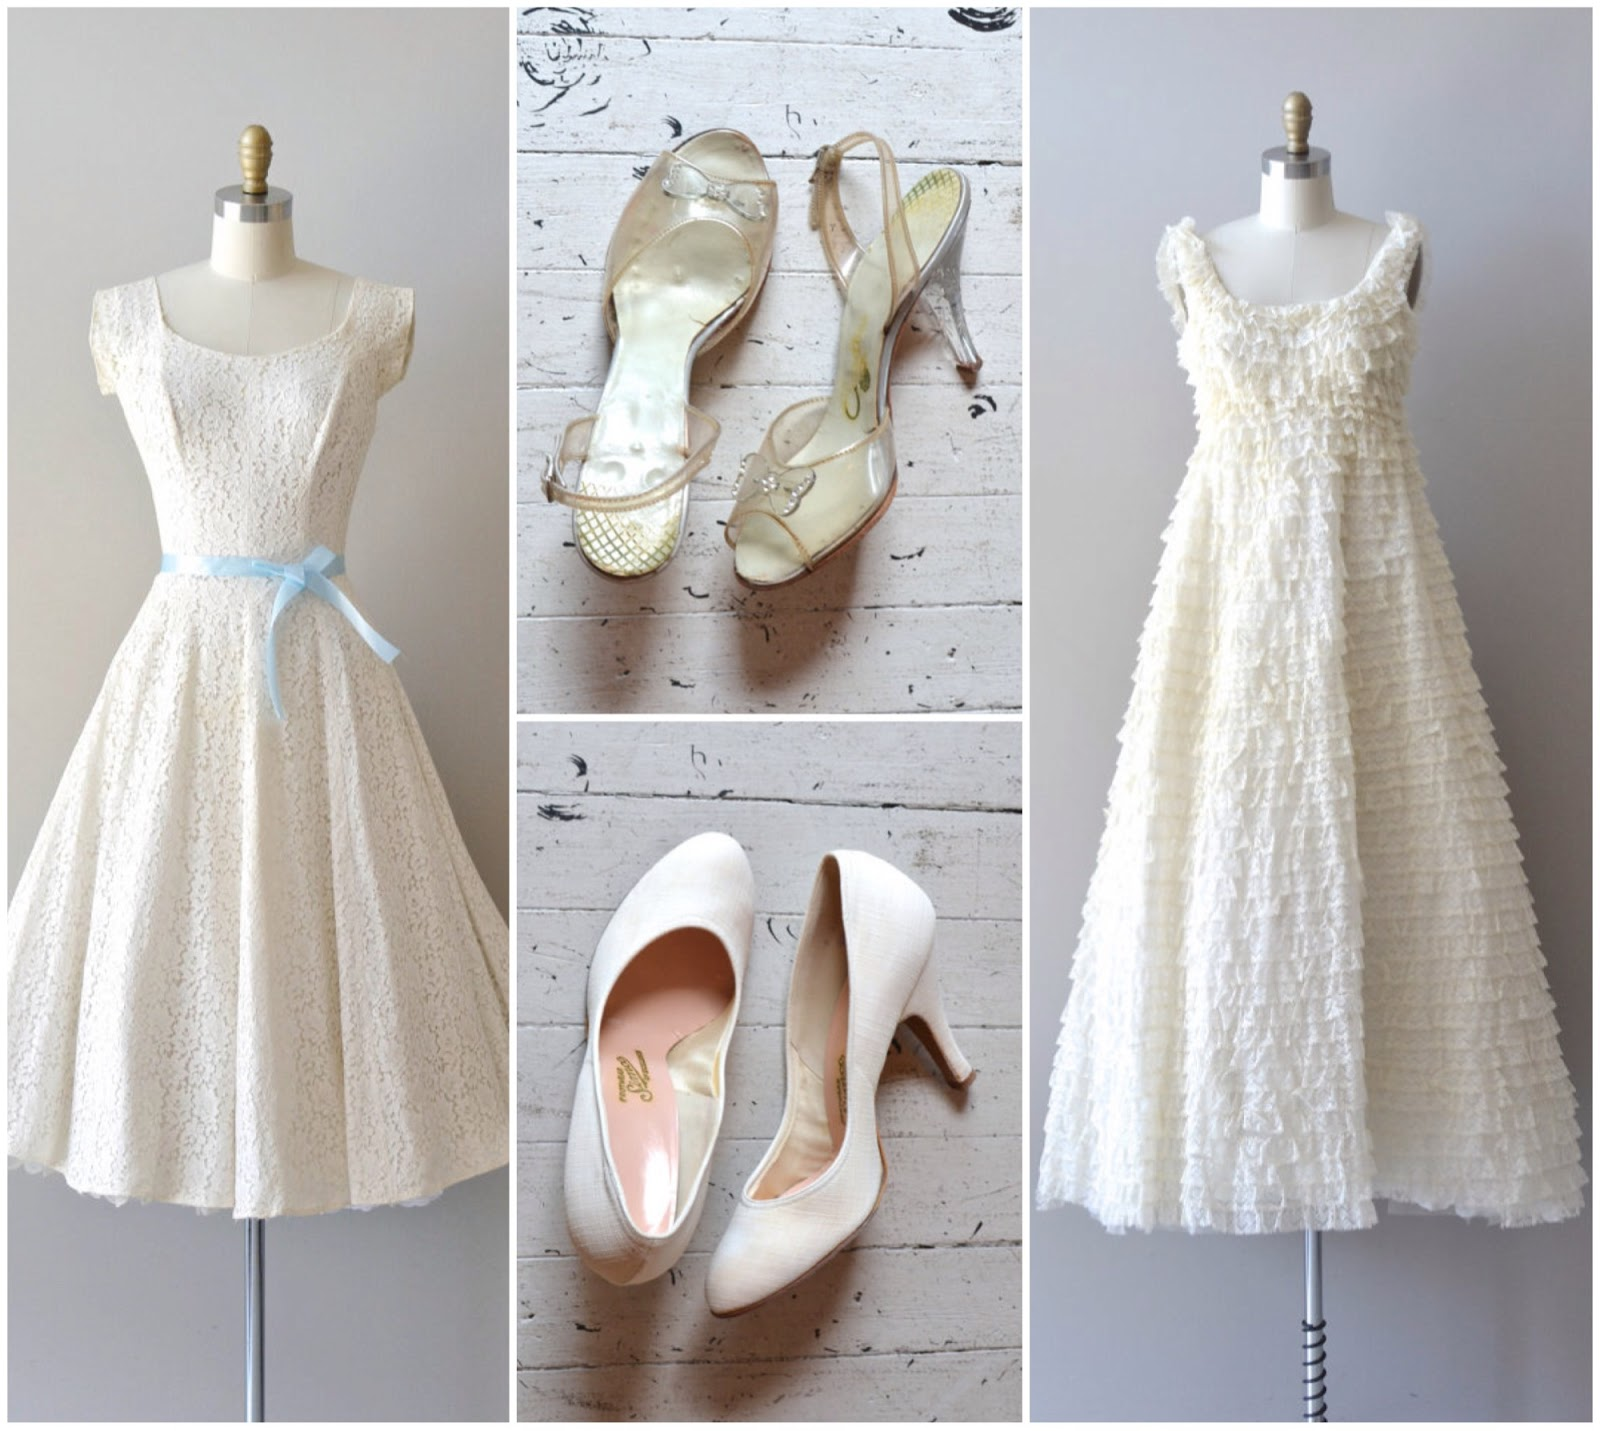 fe3574c8d110 Vintage White Dress JPVQHm